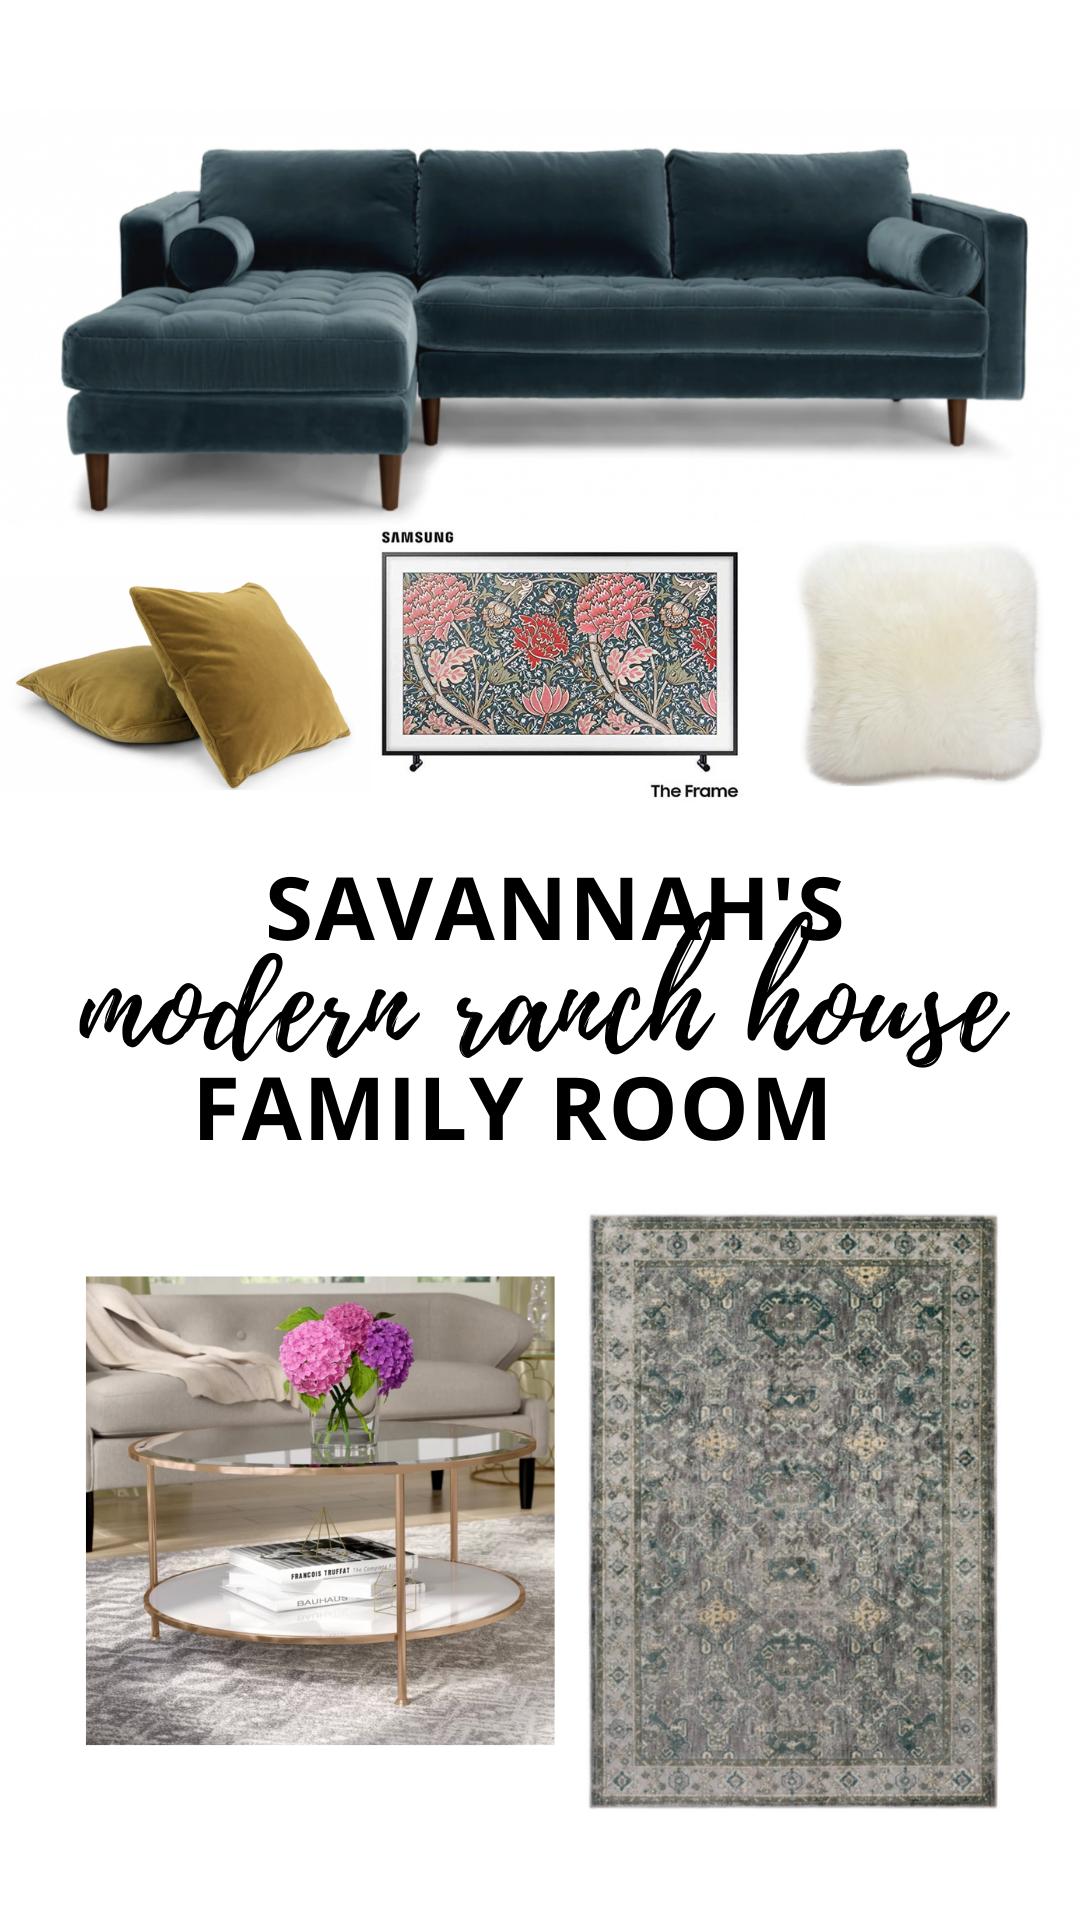 Savannah's Family Room Details